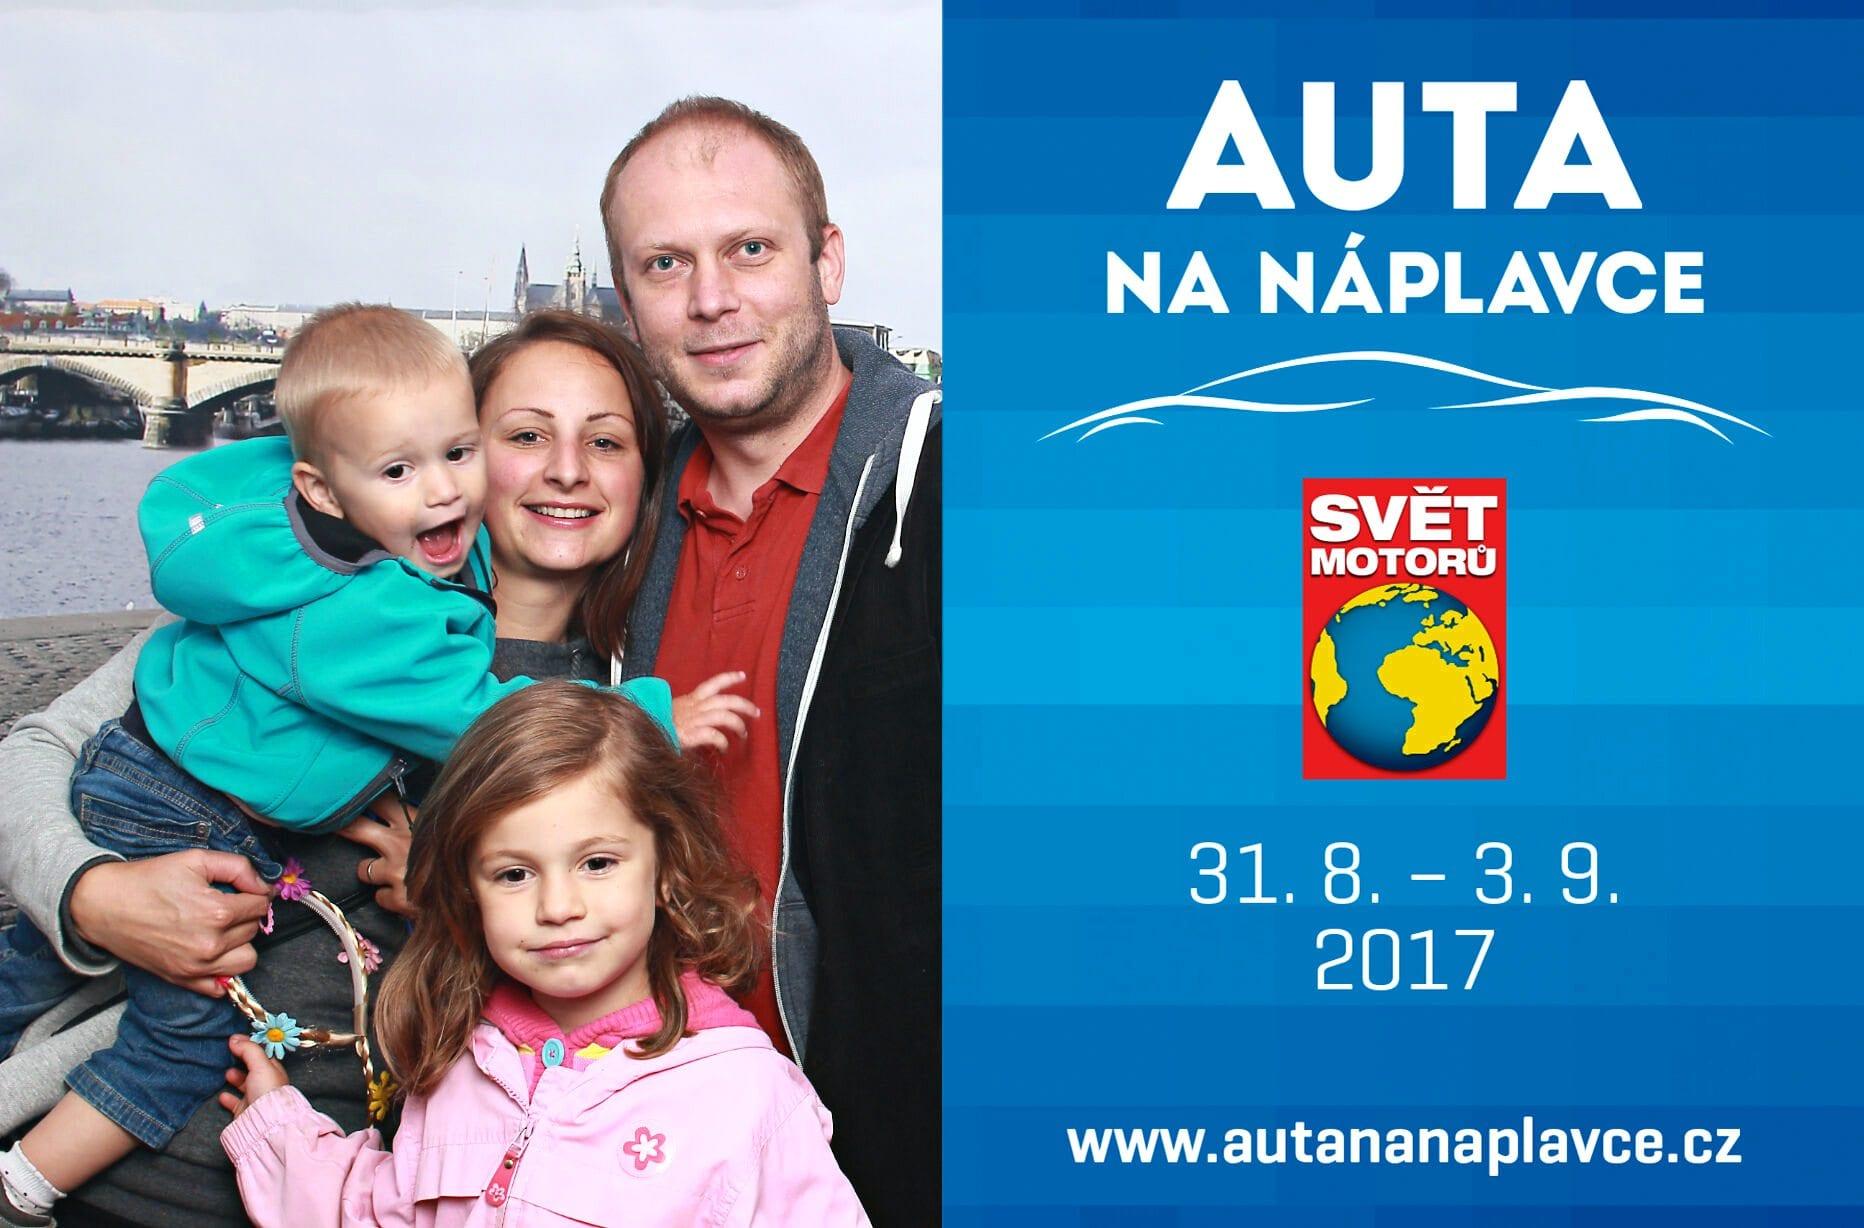 fotokoutek-auta-na-naplavce-2-9-2017-302019